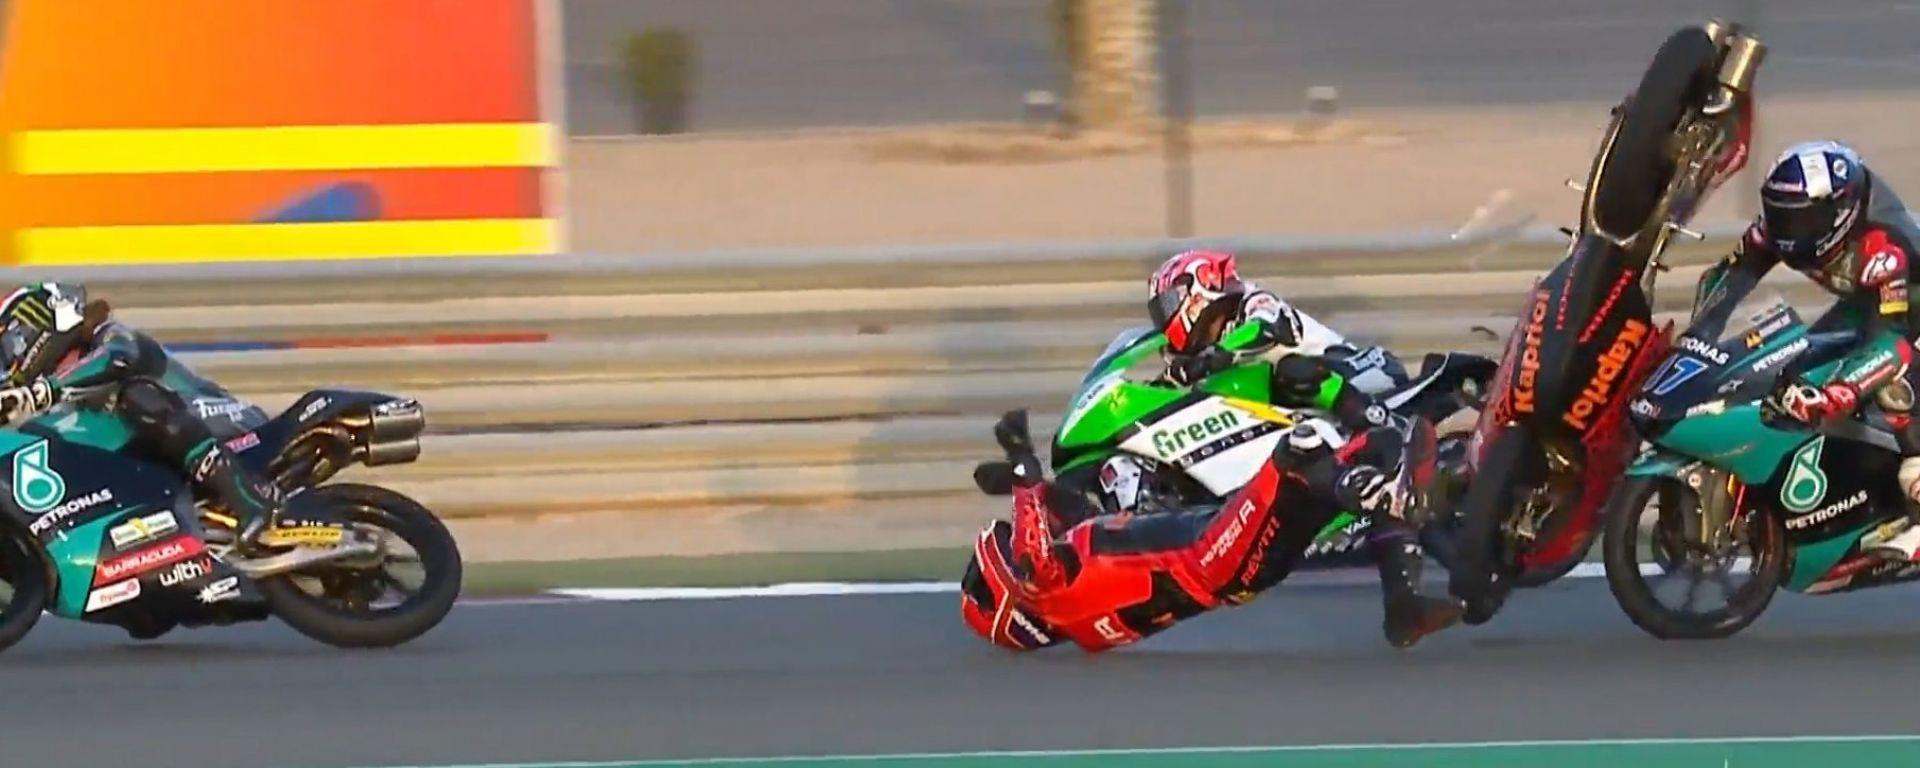 Moto3, GP Doha: l'incidente che ha coinvolto John McPhee